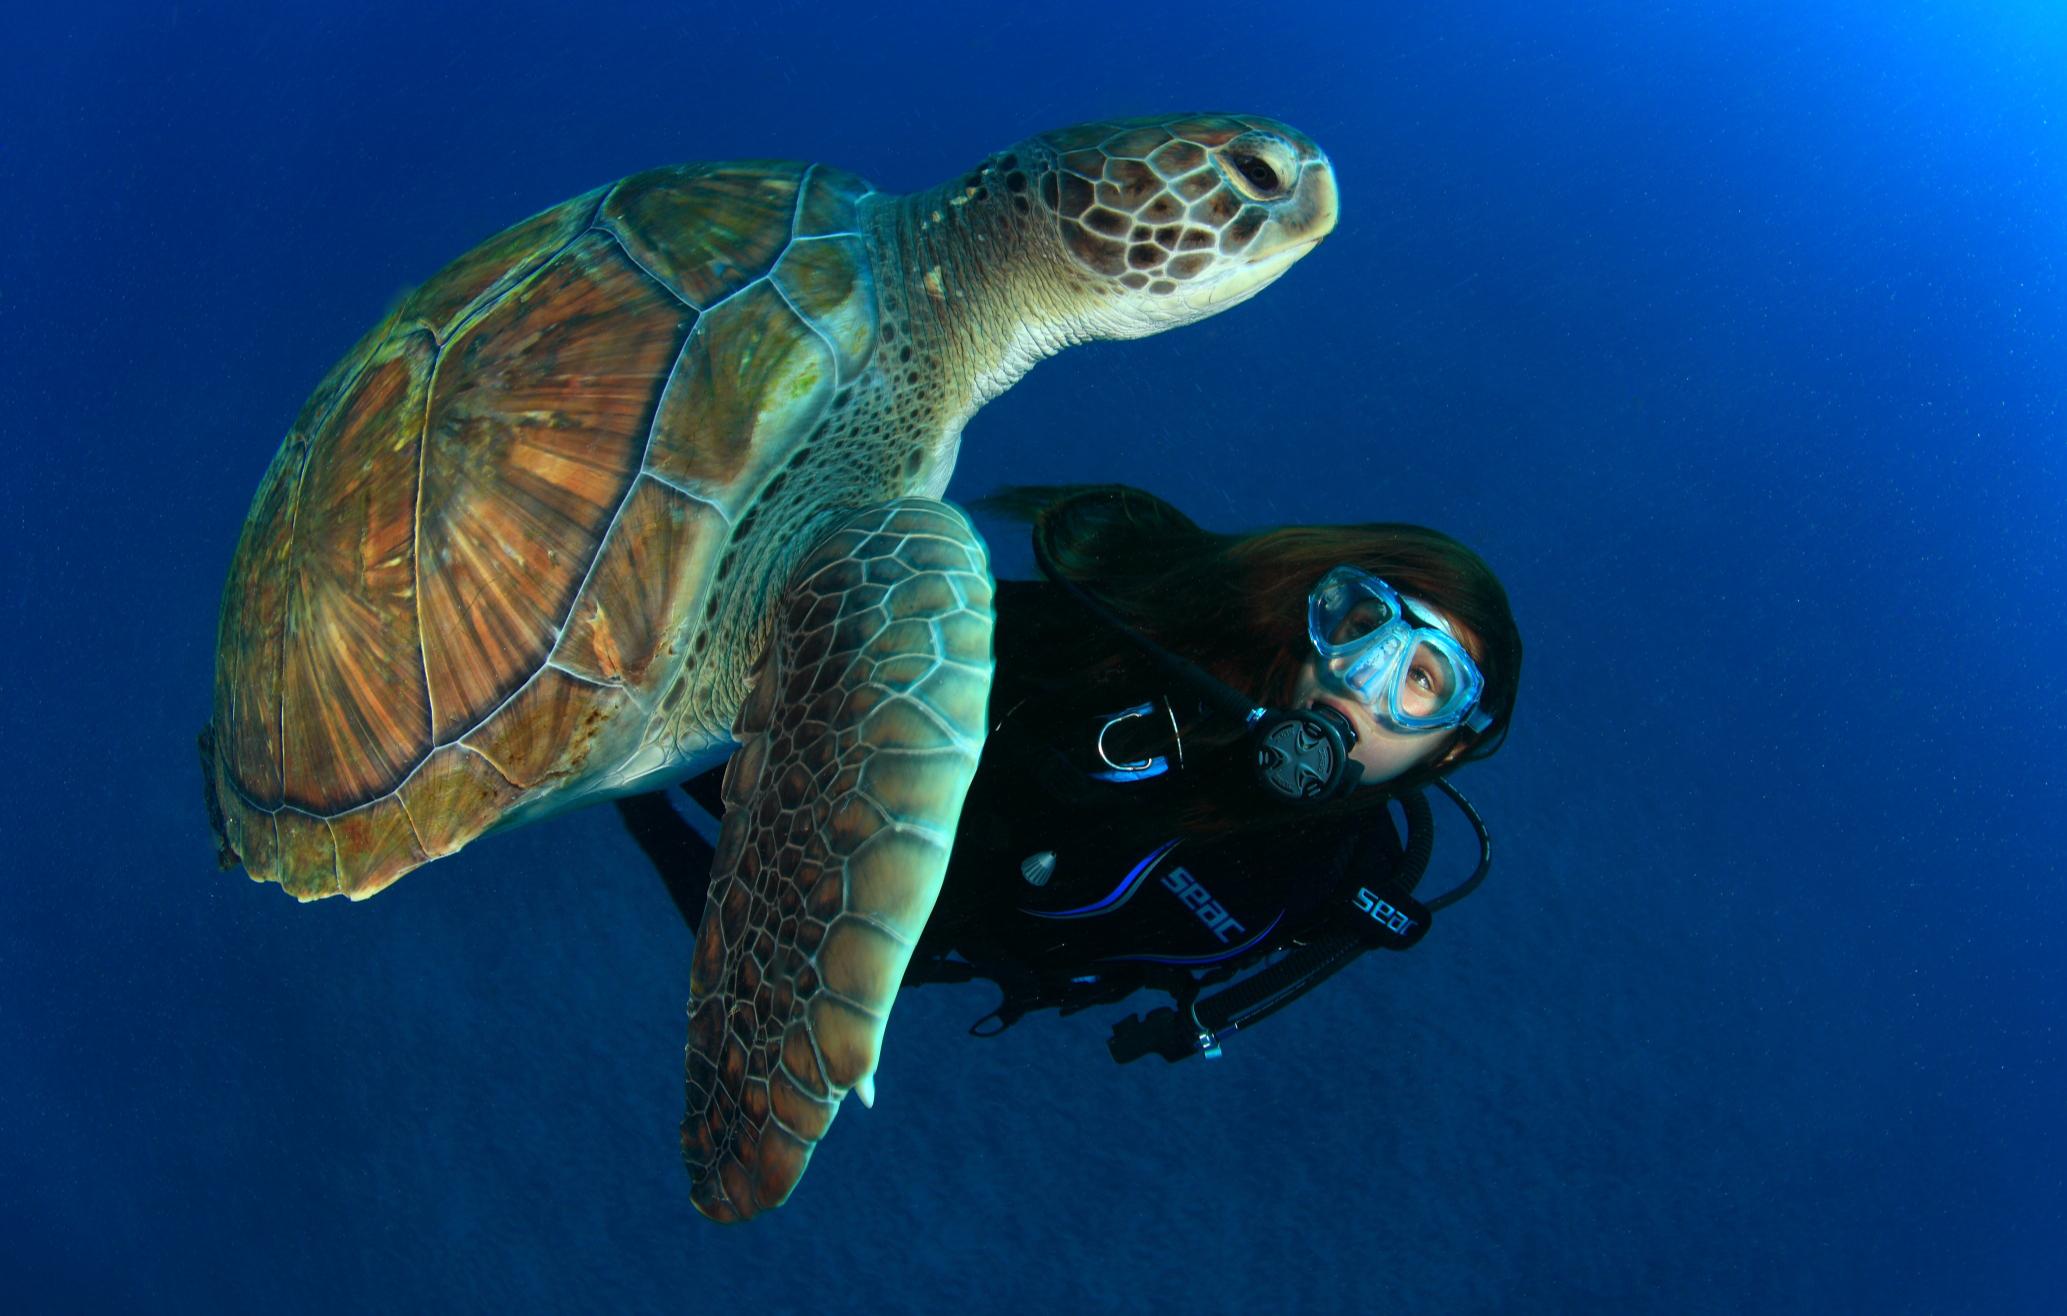 tauchkurs-open-water-diver-beginner-in-nordhausen-bg2